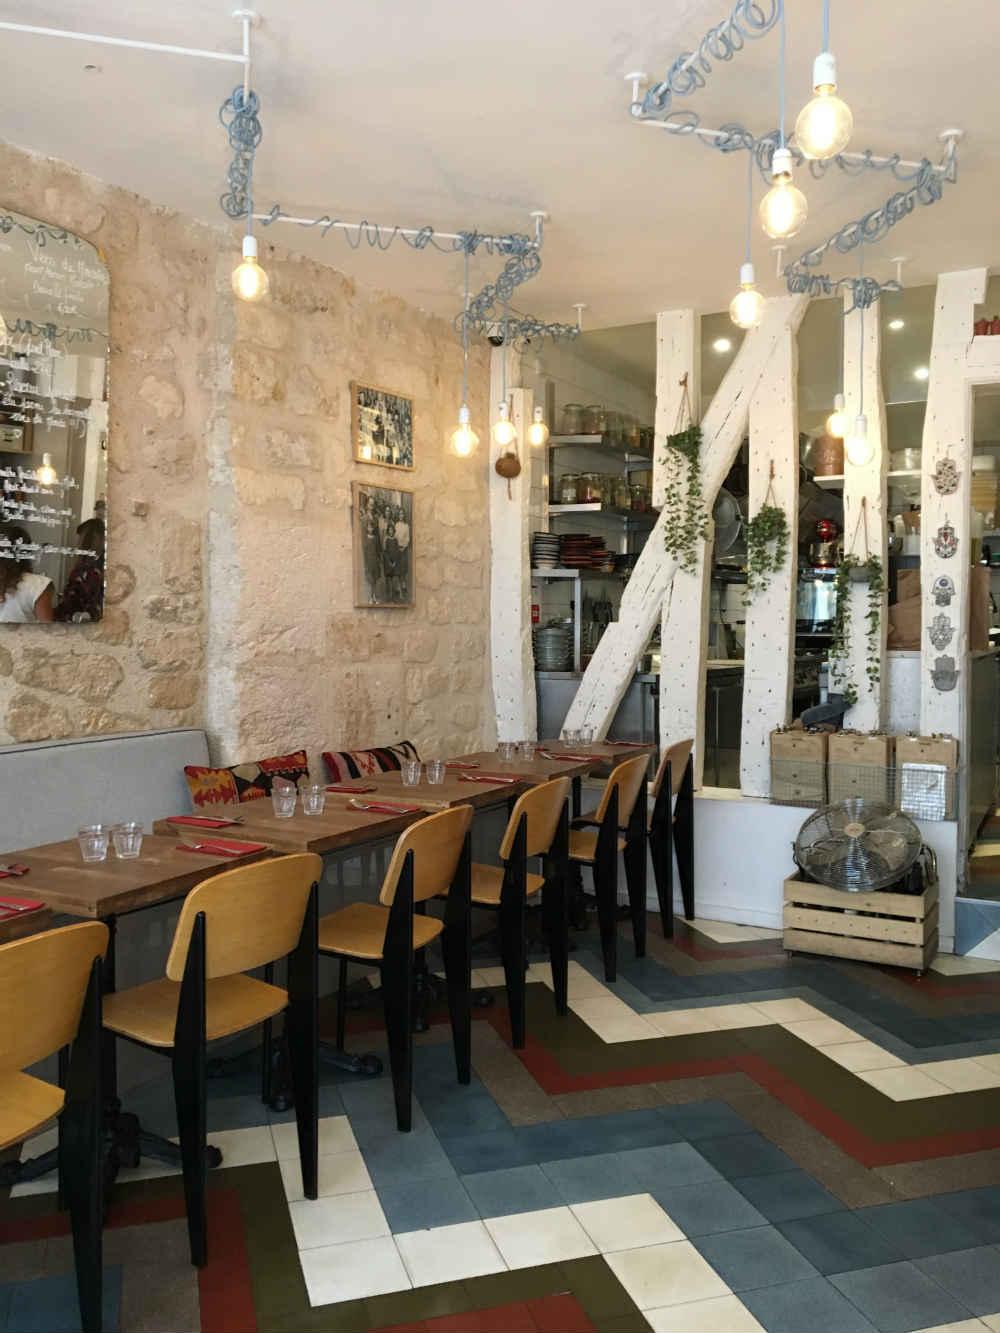 Tavline, restaurant israélien dans le <strong>Marais</strong>